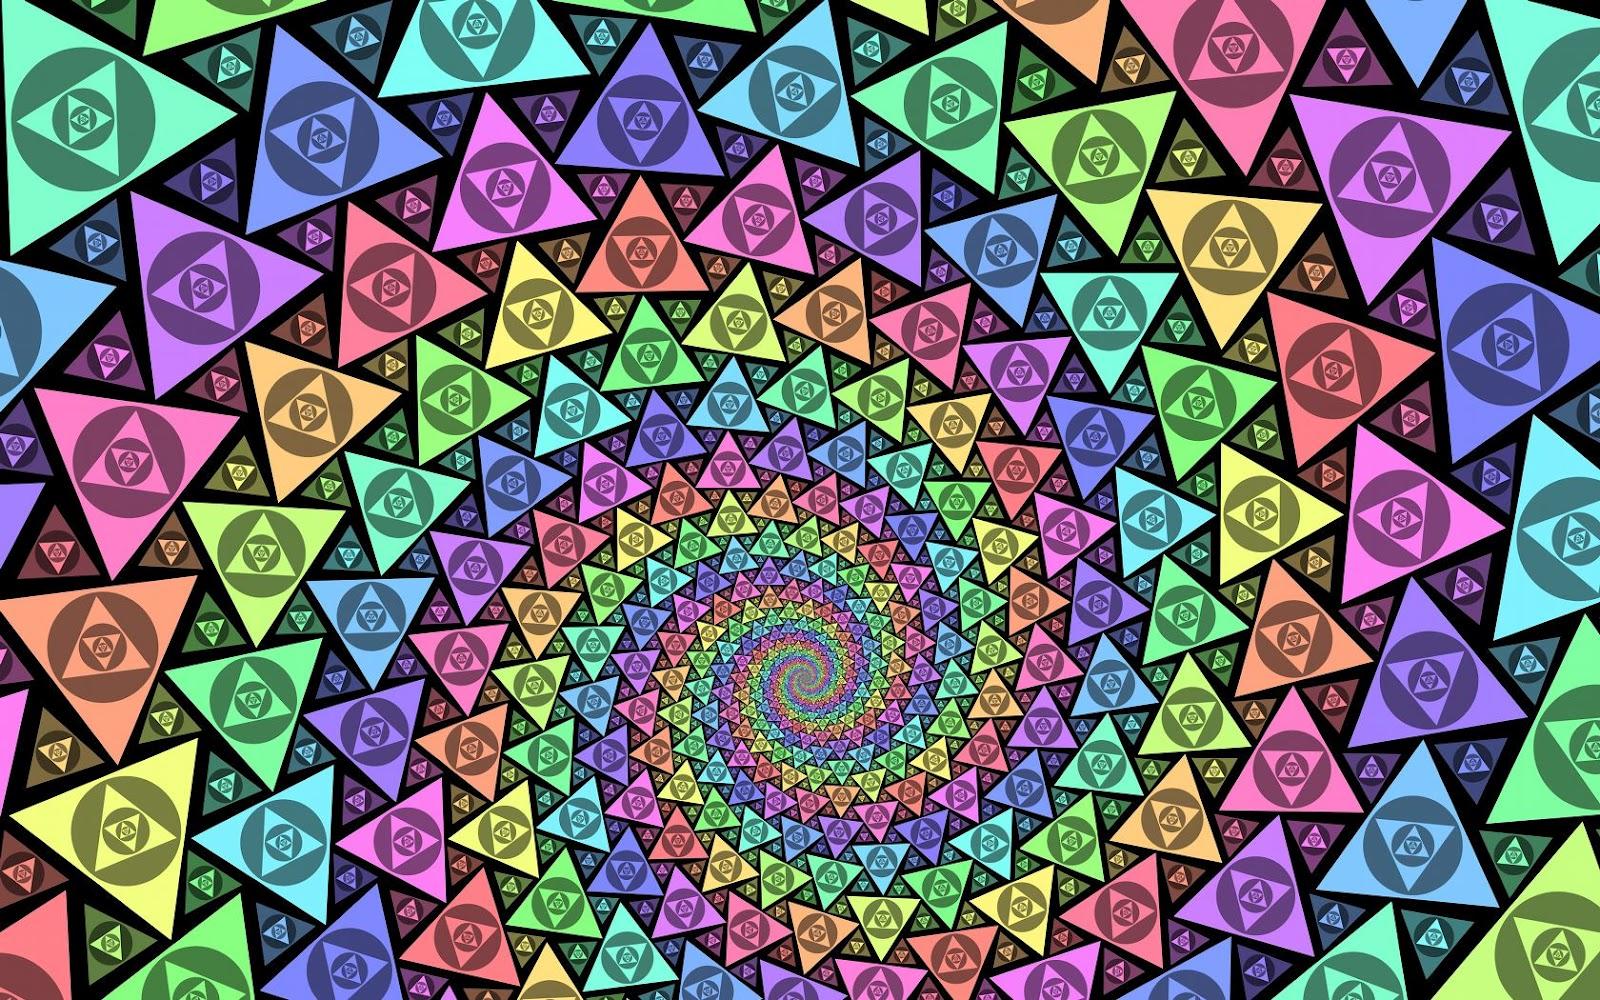 http://3.bp.blogspot.com/-OSOWCrwlHdo/UO4I-GQ2NhI/AAAAAAAAAfA/pwXRAwjJ5Lo/s1600/psychedelic-wallpaper-vortex.jpg